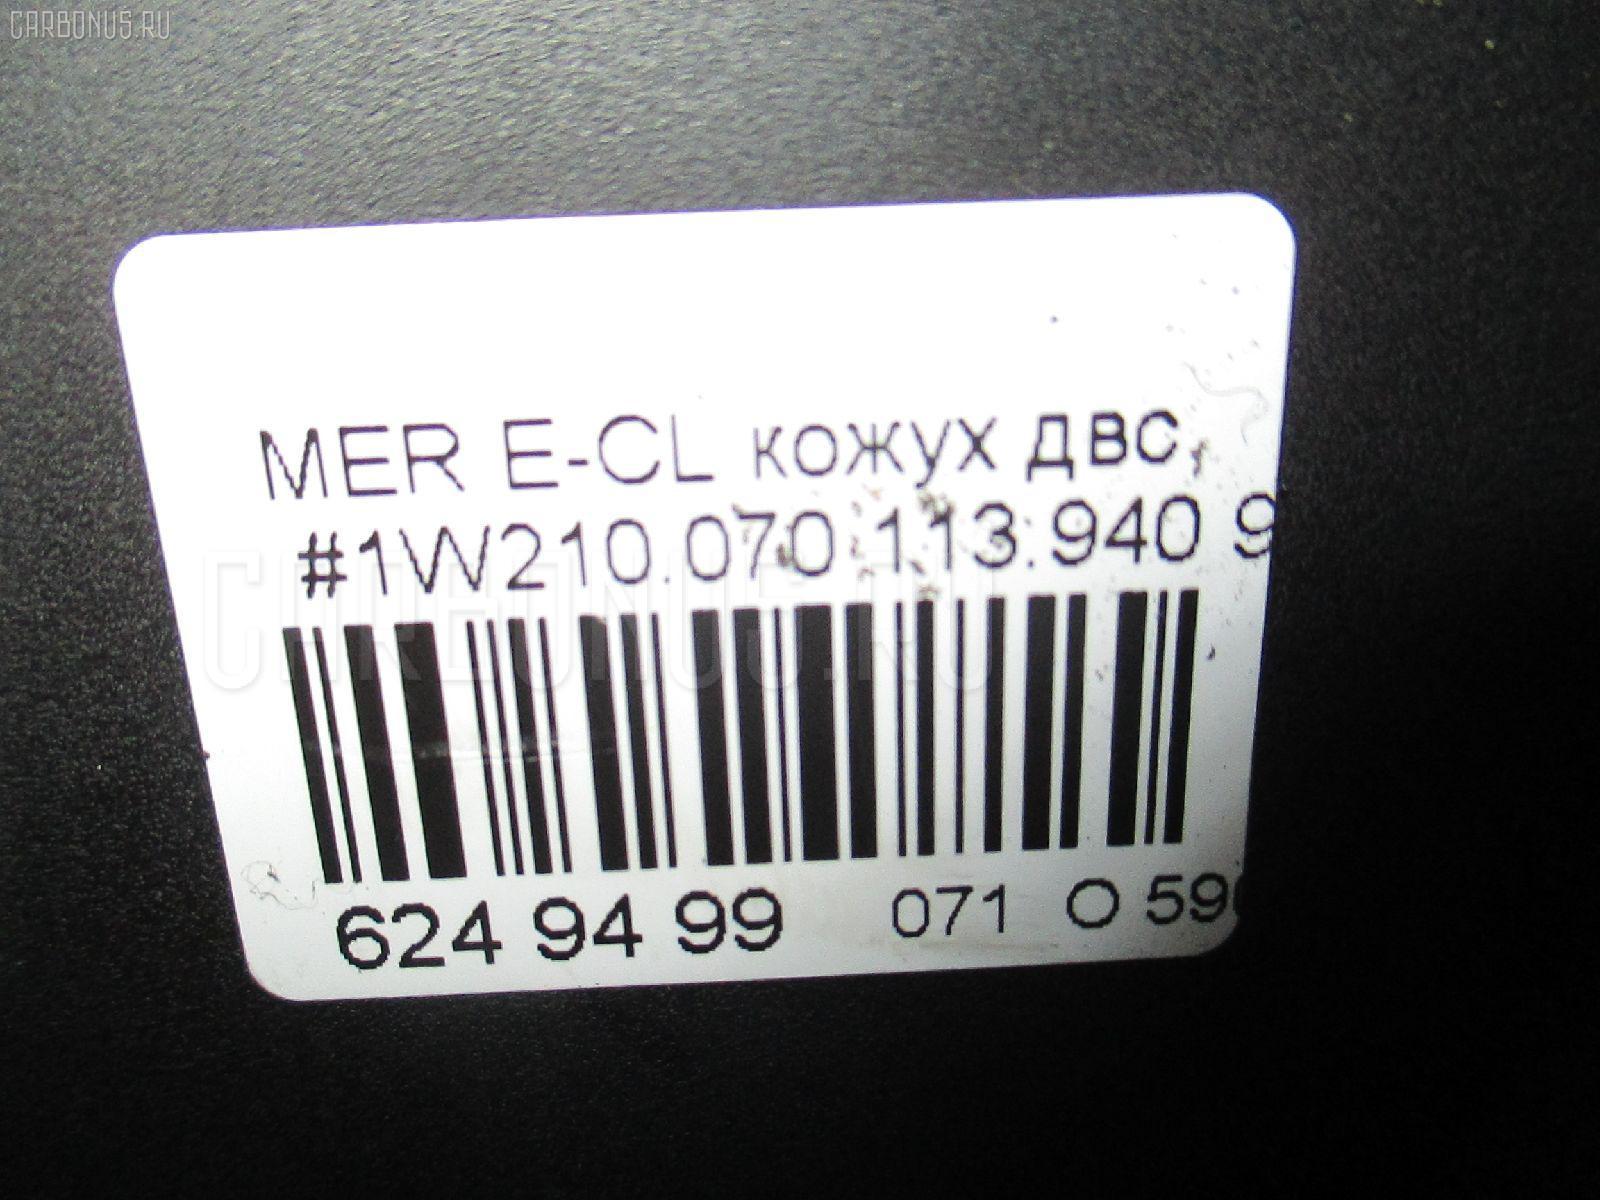 Кожух ДВС MERCEDES-BENZ E-CLASS W210.070 113.940 Фото 4